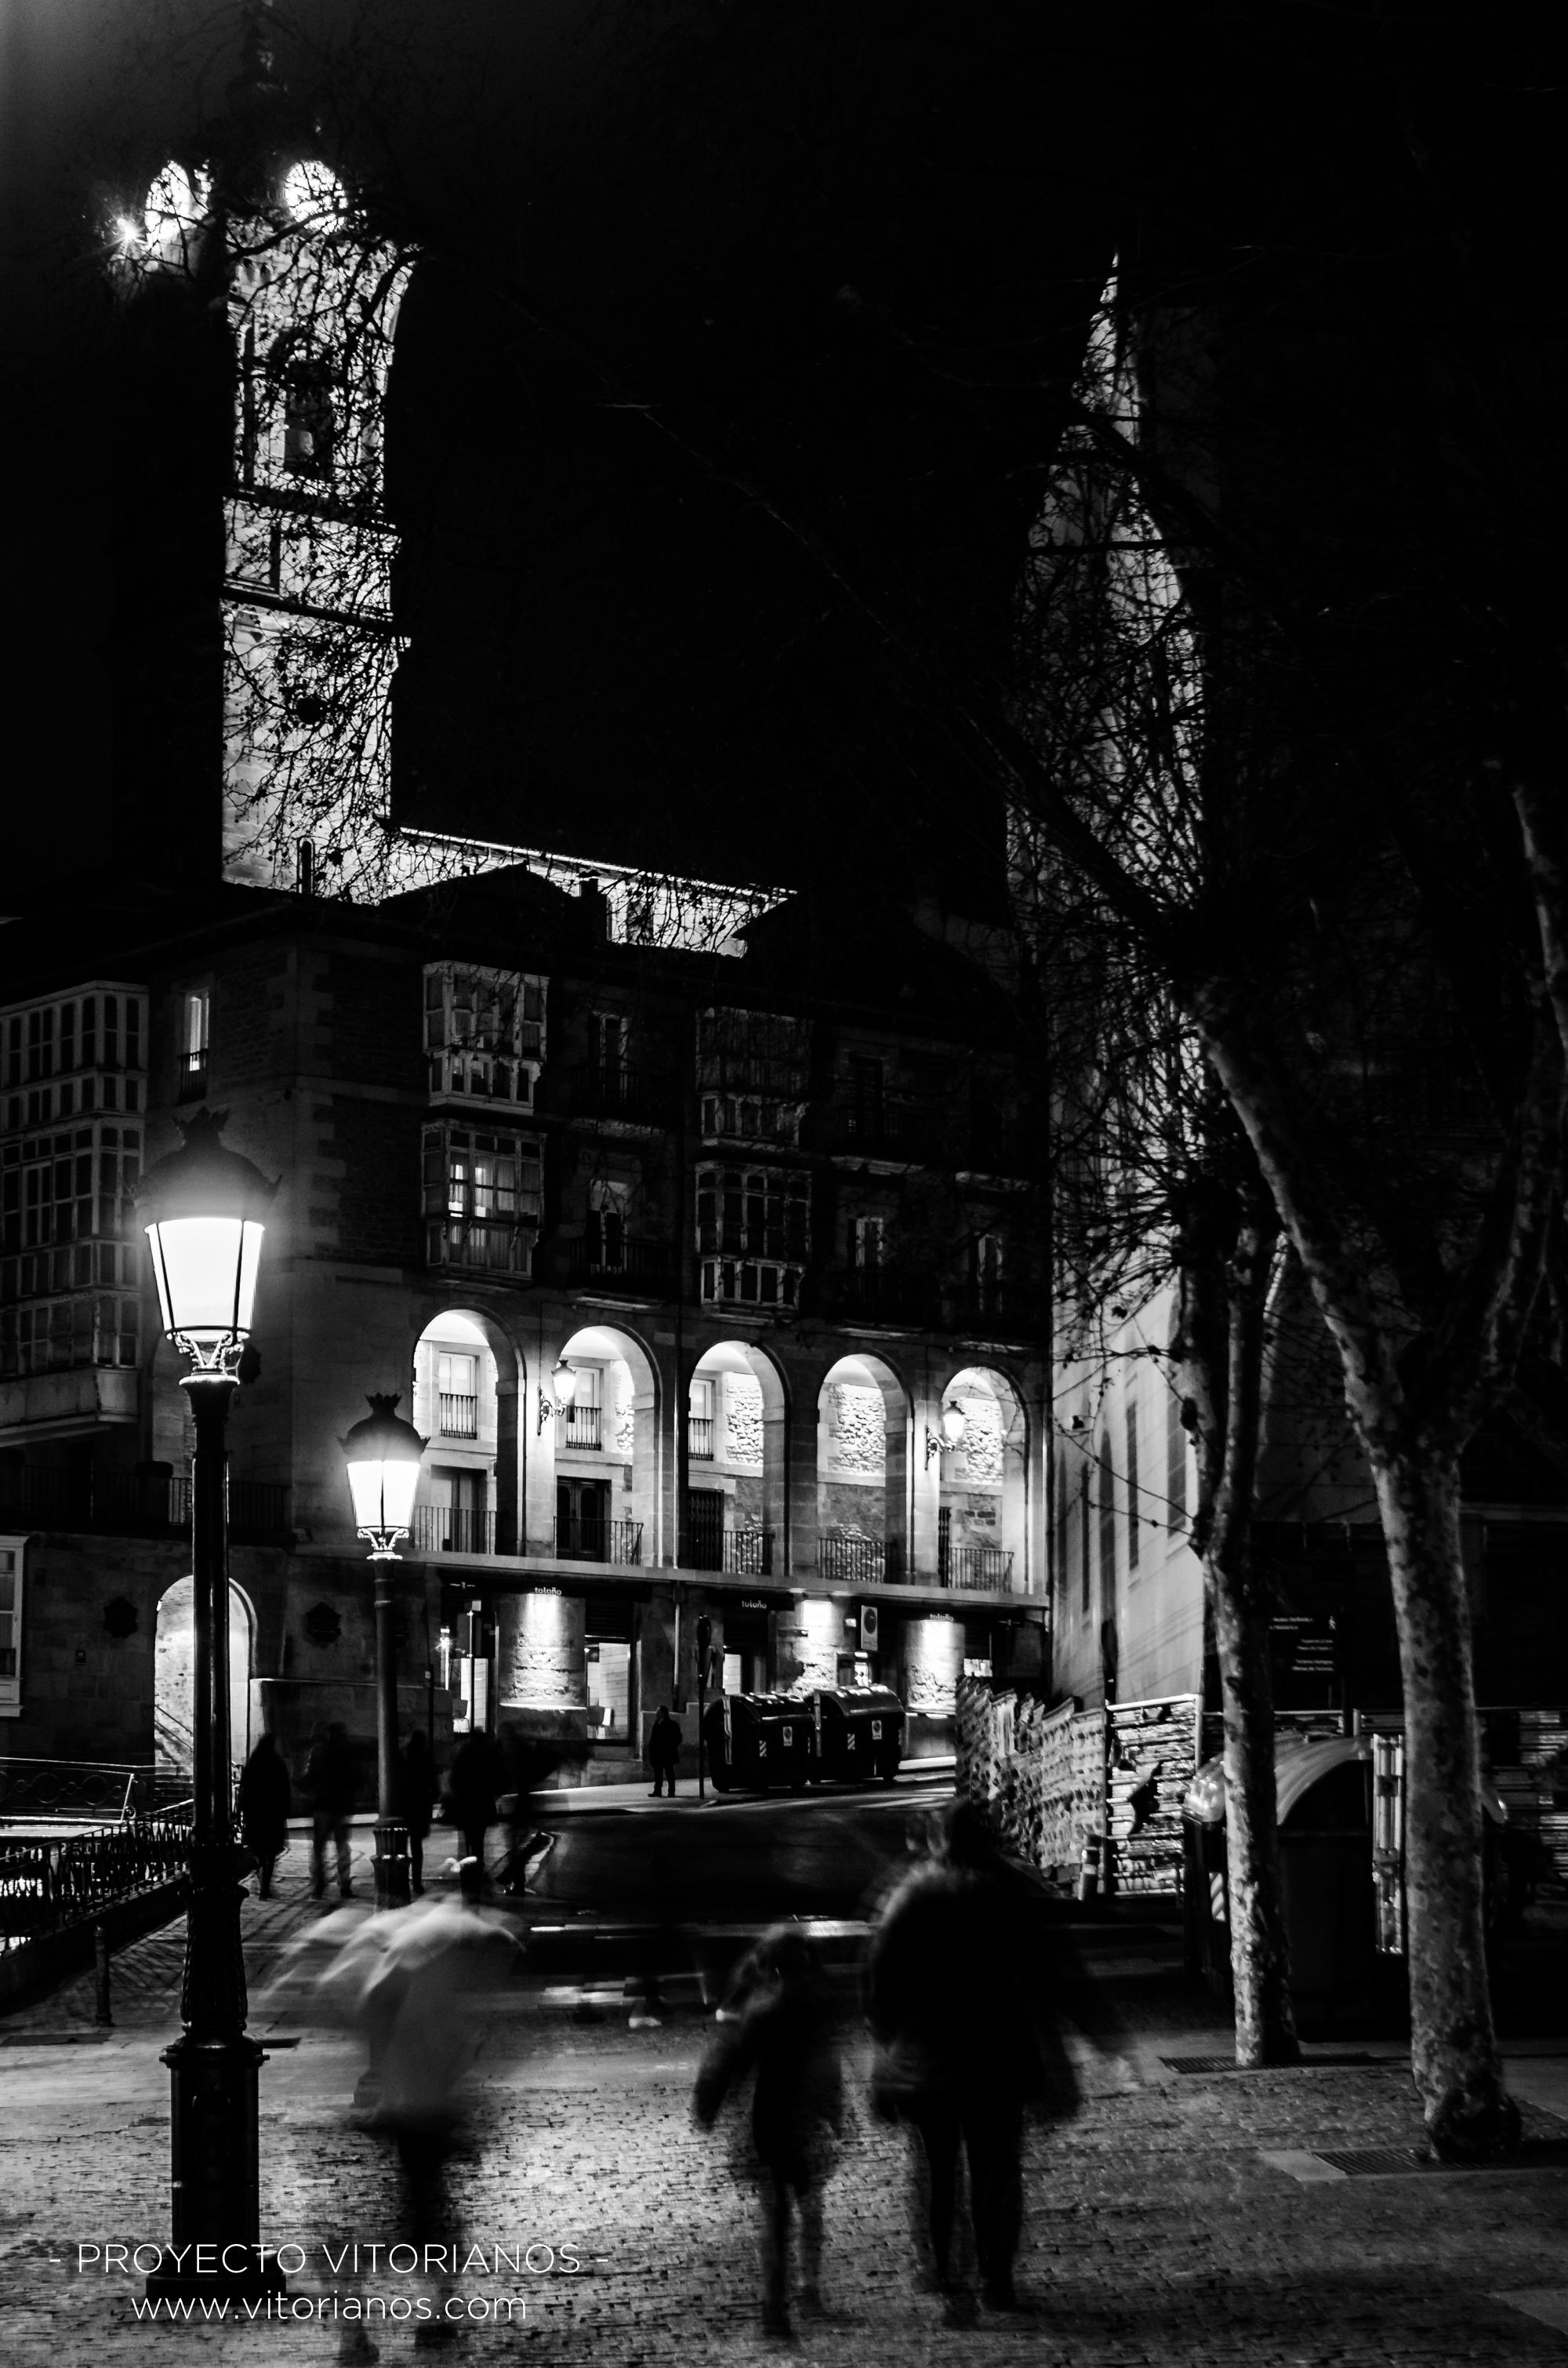 Arquillos de noche - Foto: Ainhoa Valenciano